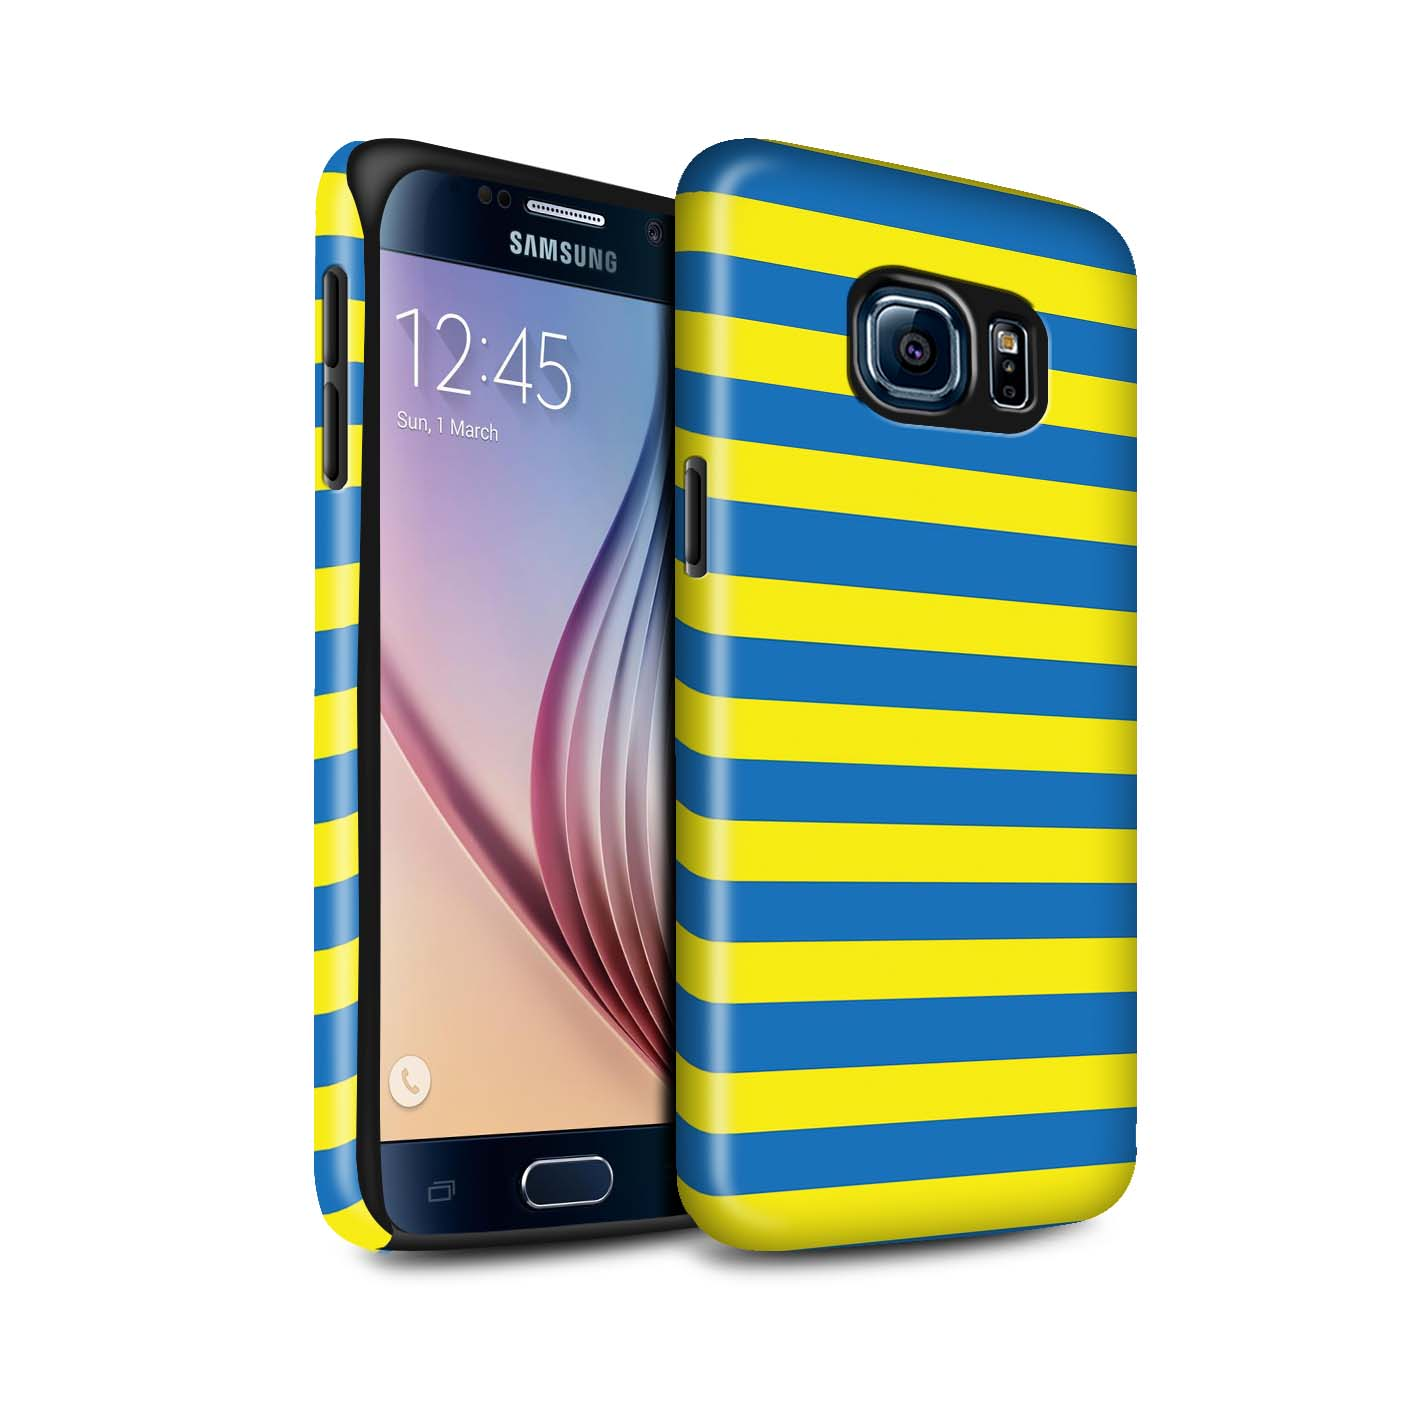 STUFF4-Gloss-Tough-Phone-Case-for-Samsung-Galaxy-S6-G920-Yellow-Fashion